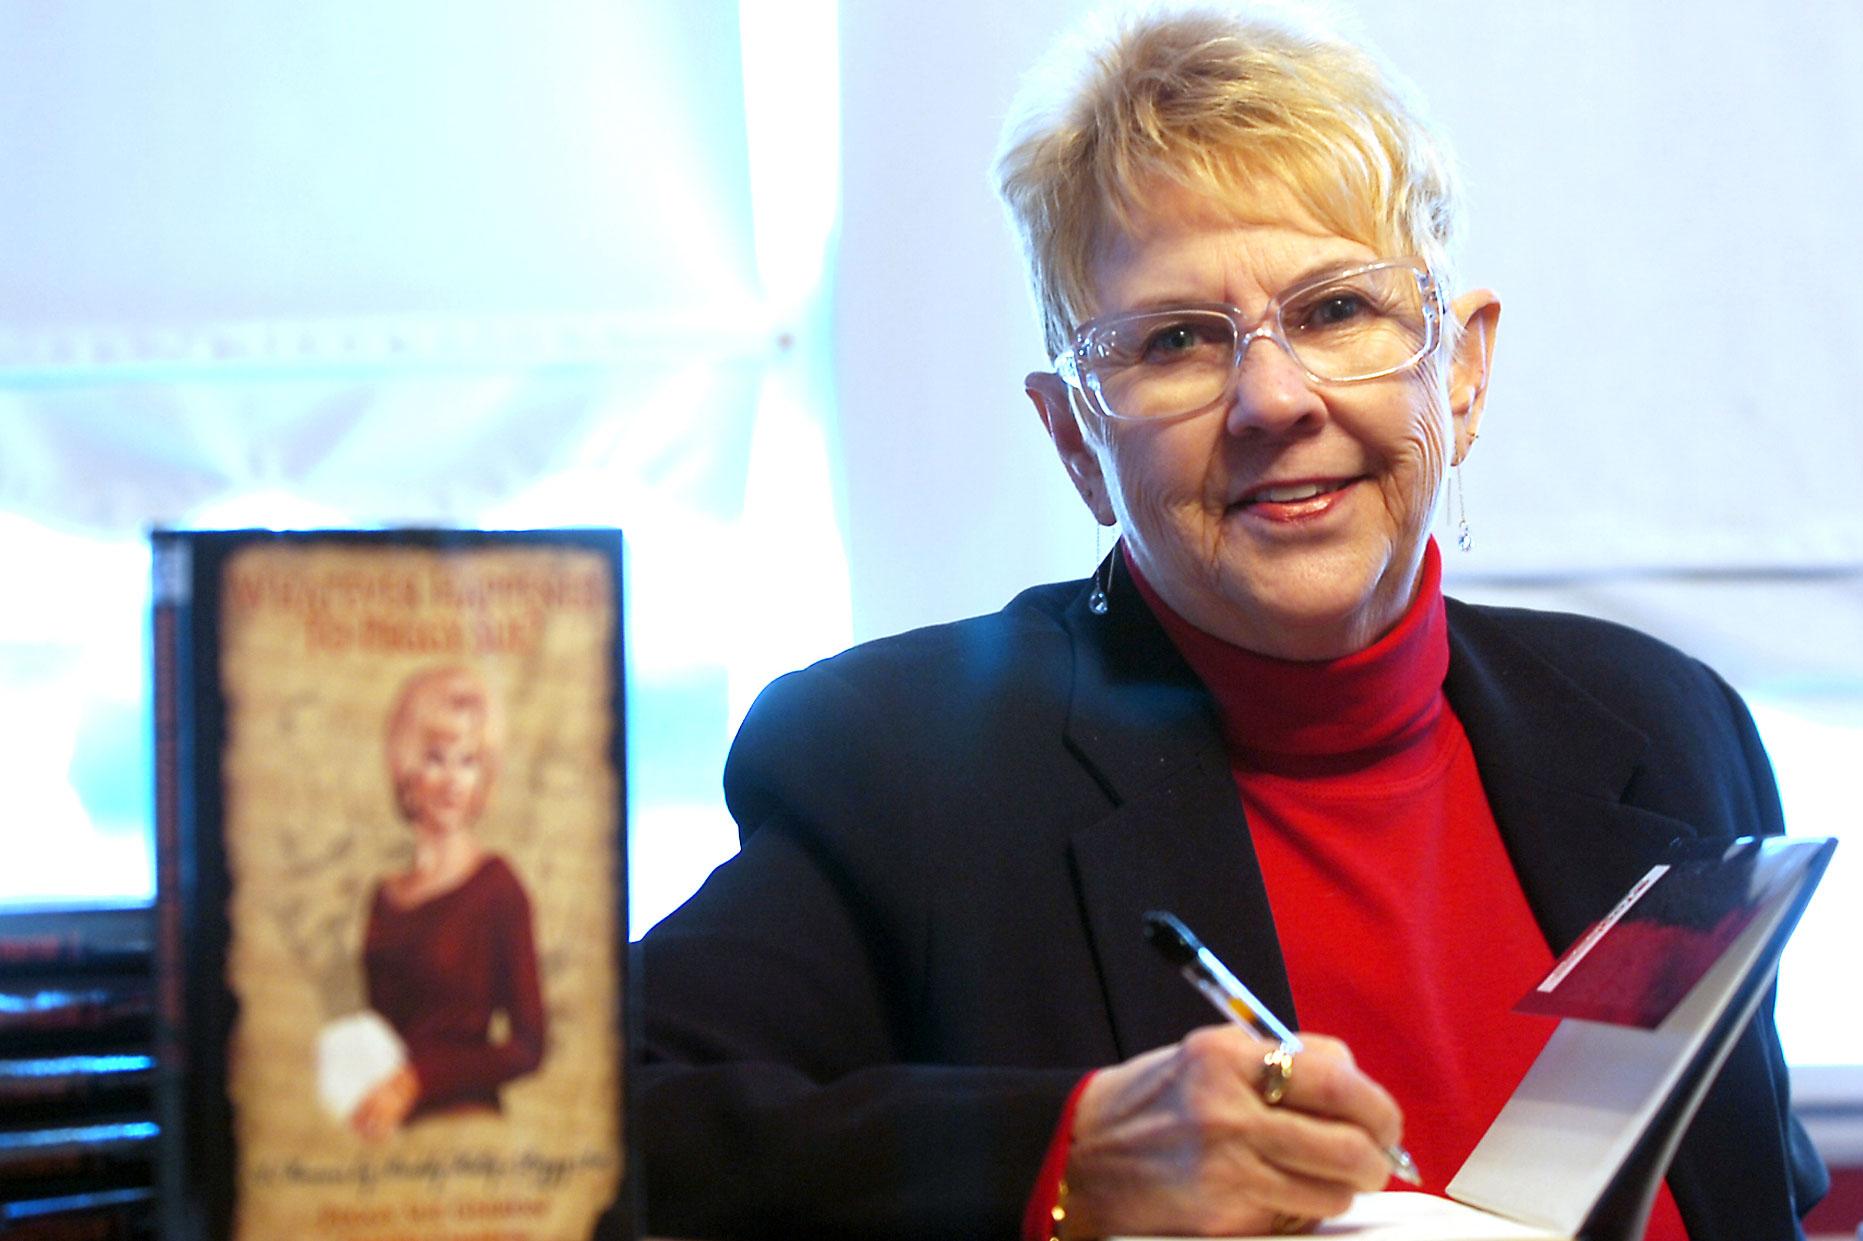 d1182c5f522 Peggy Sue Gerron unveils her new book